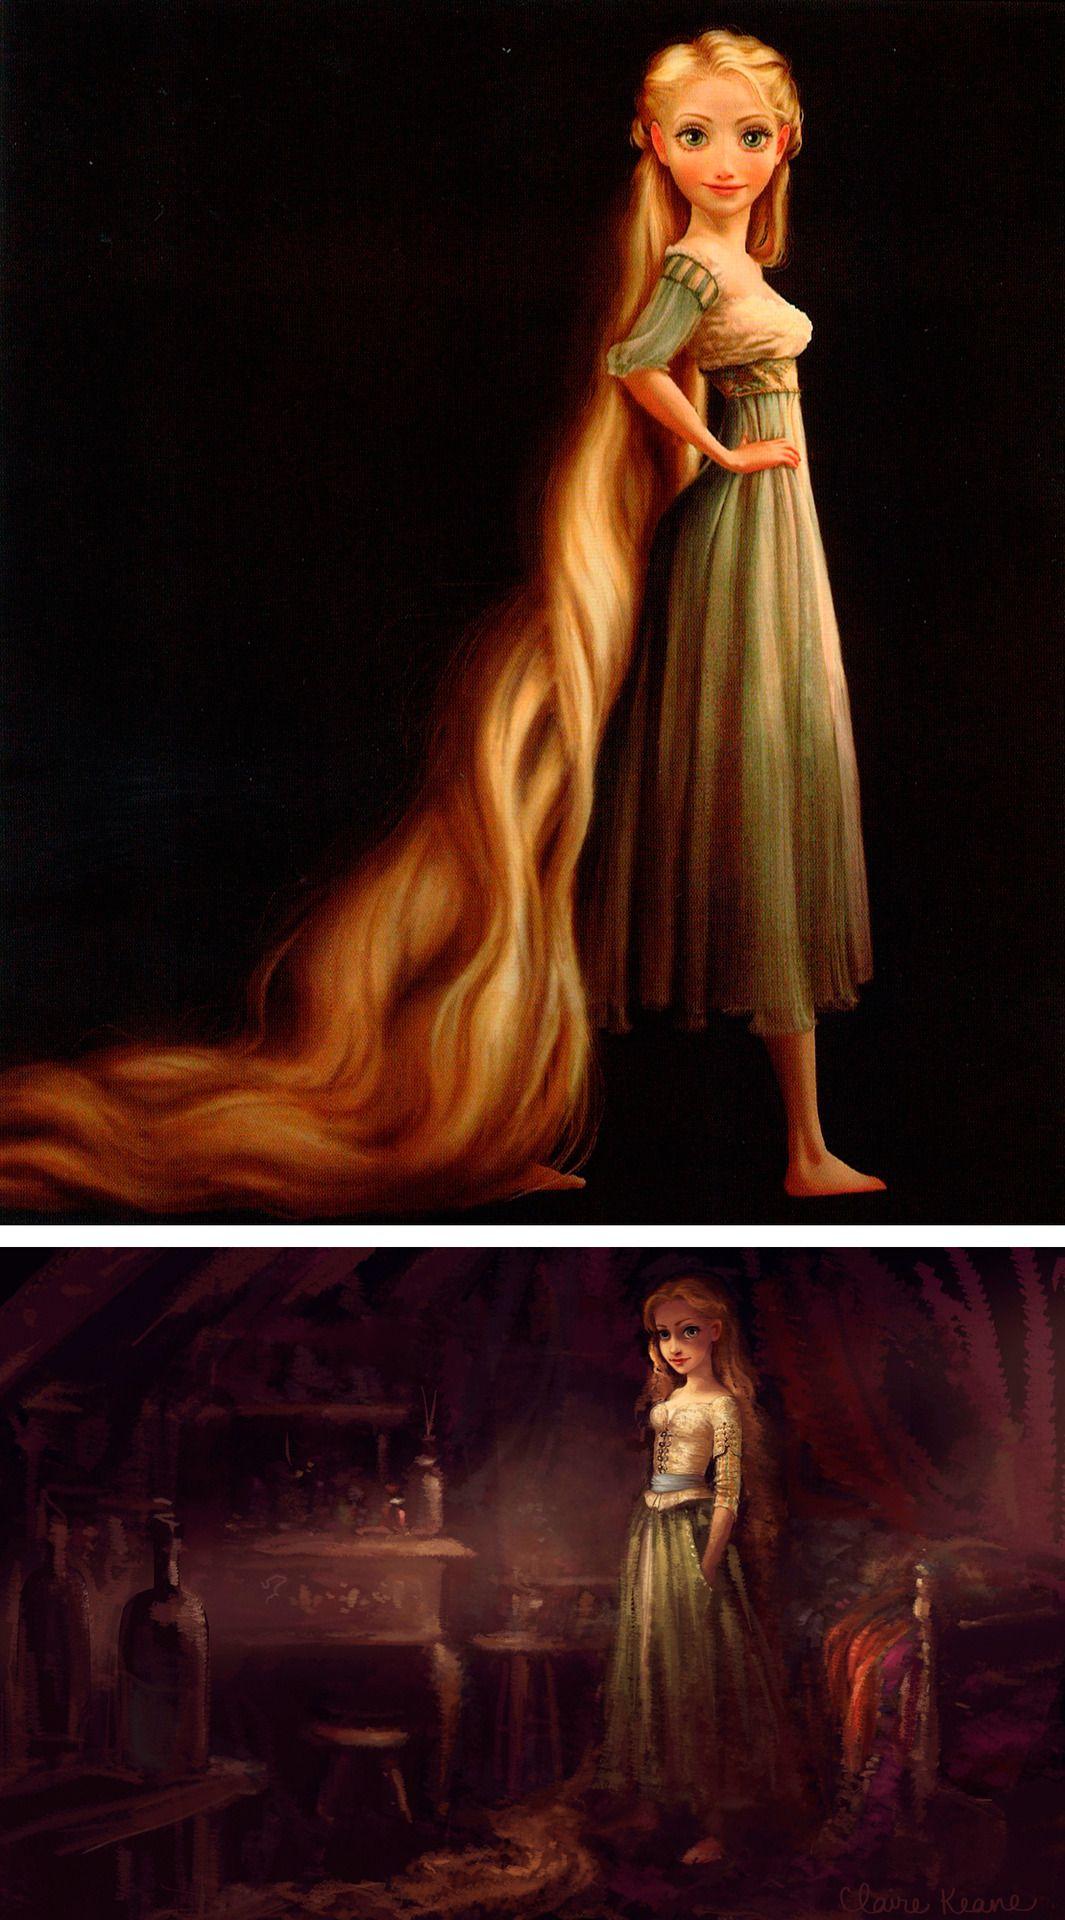 theartofanimation:  Claire Keane